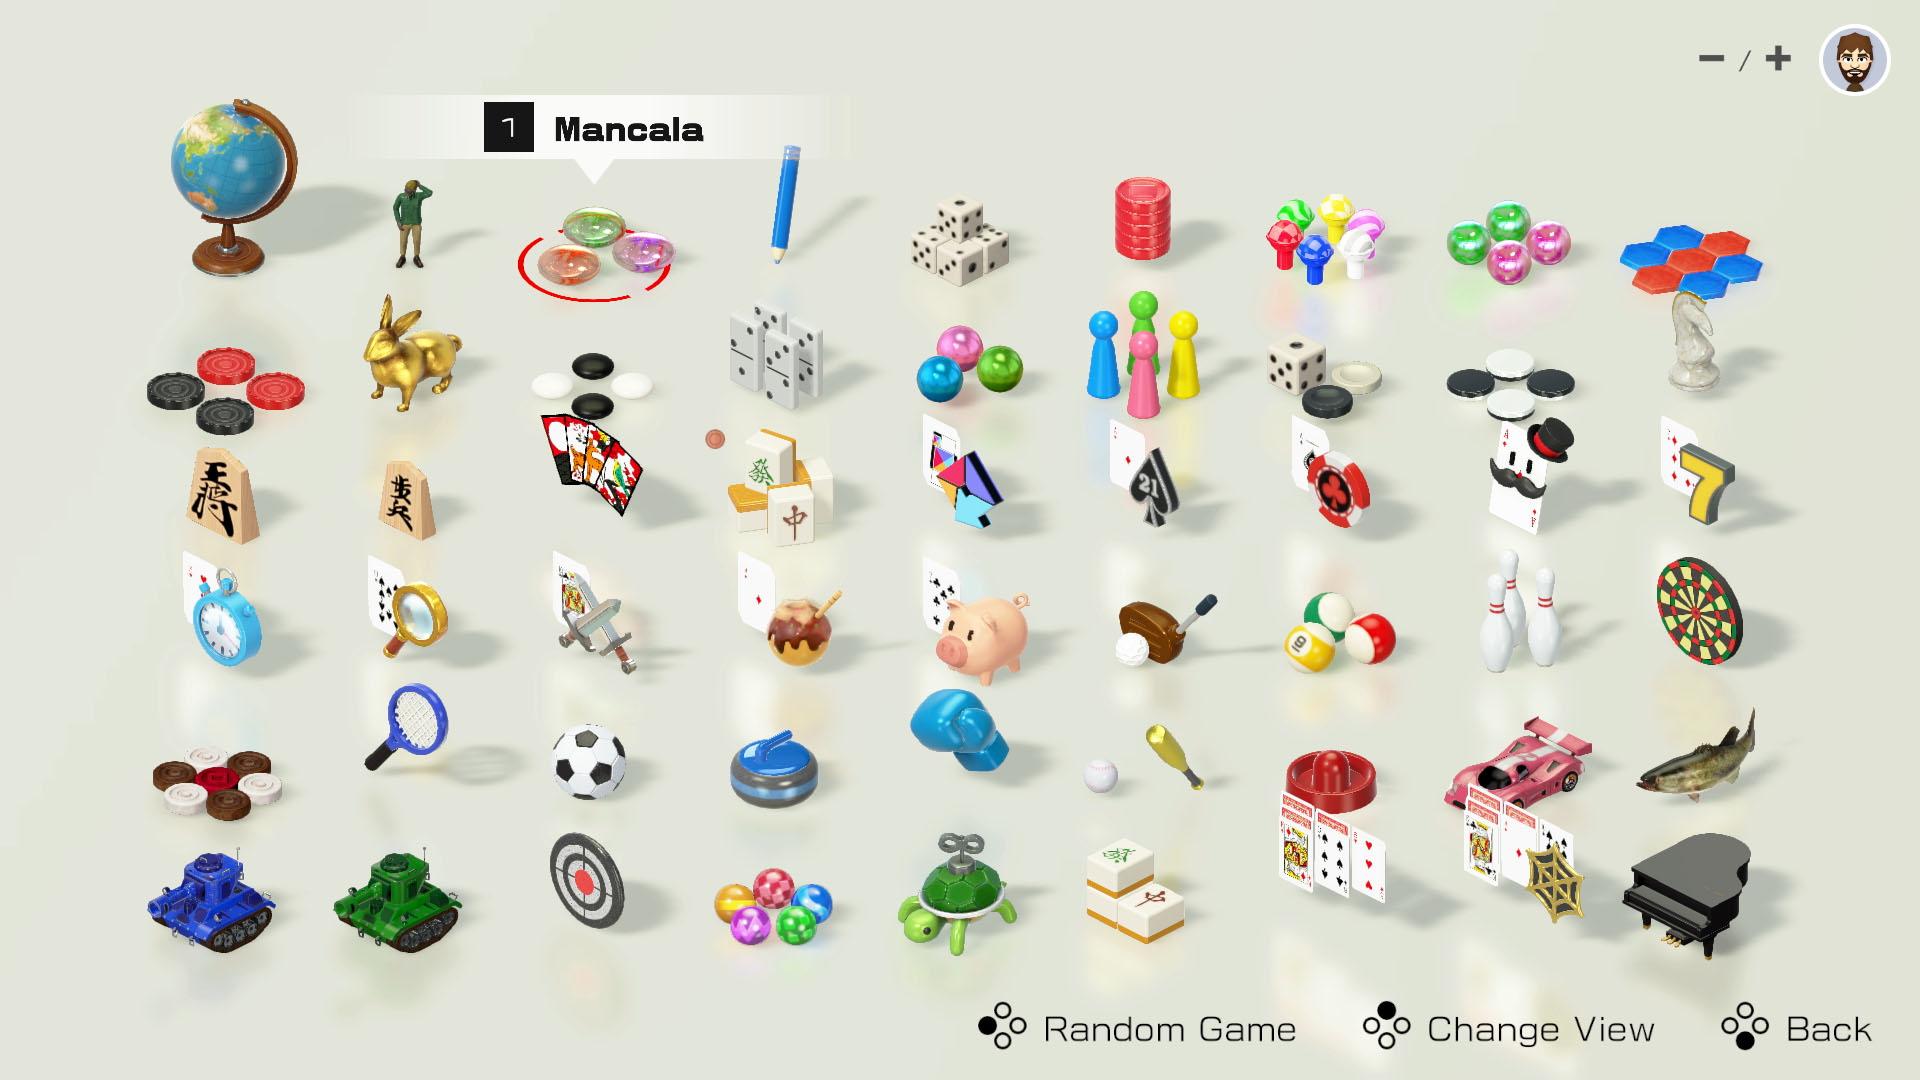 51 Worldwide Games - Spieleliste